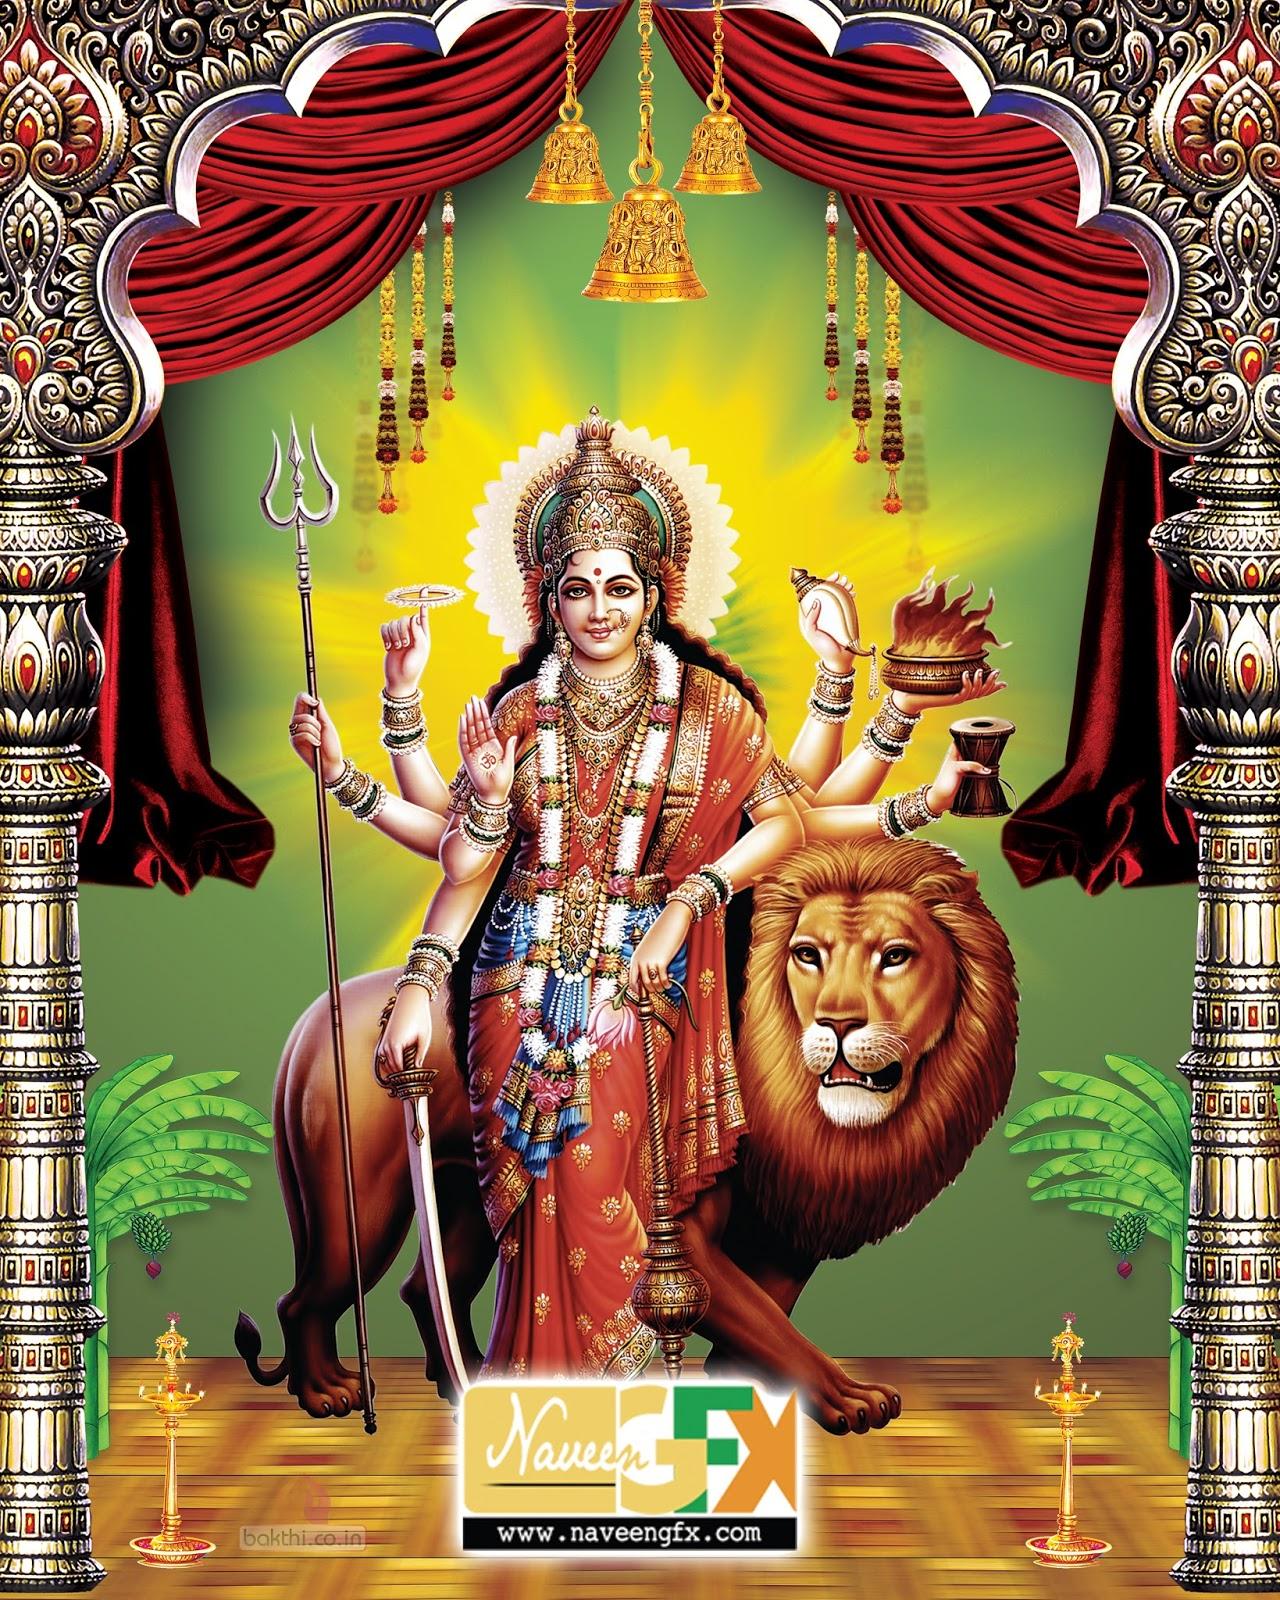 Most Inspiring Wallpaper Lord Durga - goddess-durga-matha-HD-wallpapers-images-pictures-pics-free-downloads-bakthi  Graphic_946293.jpg